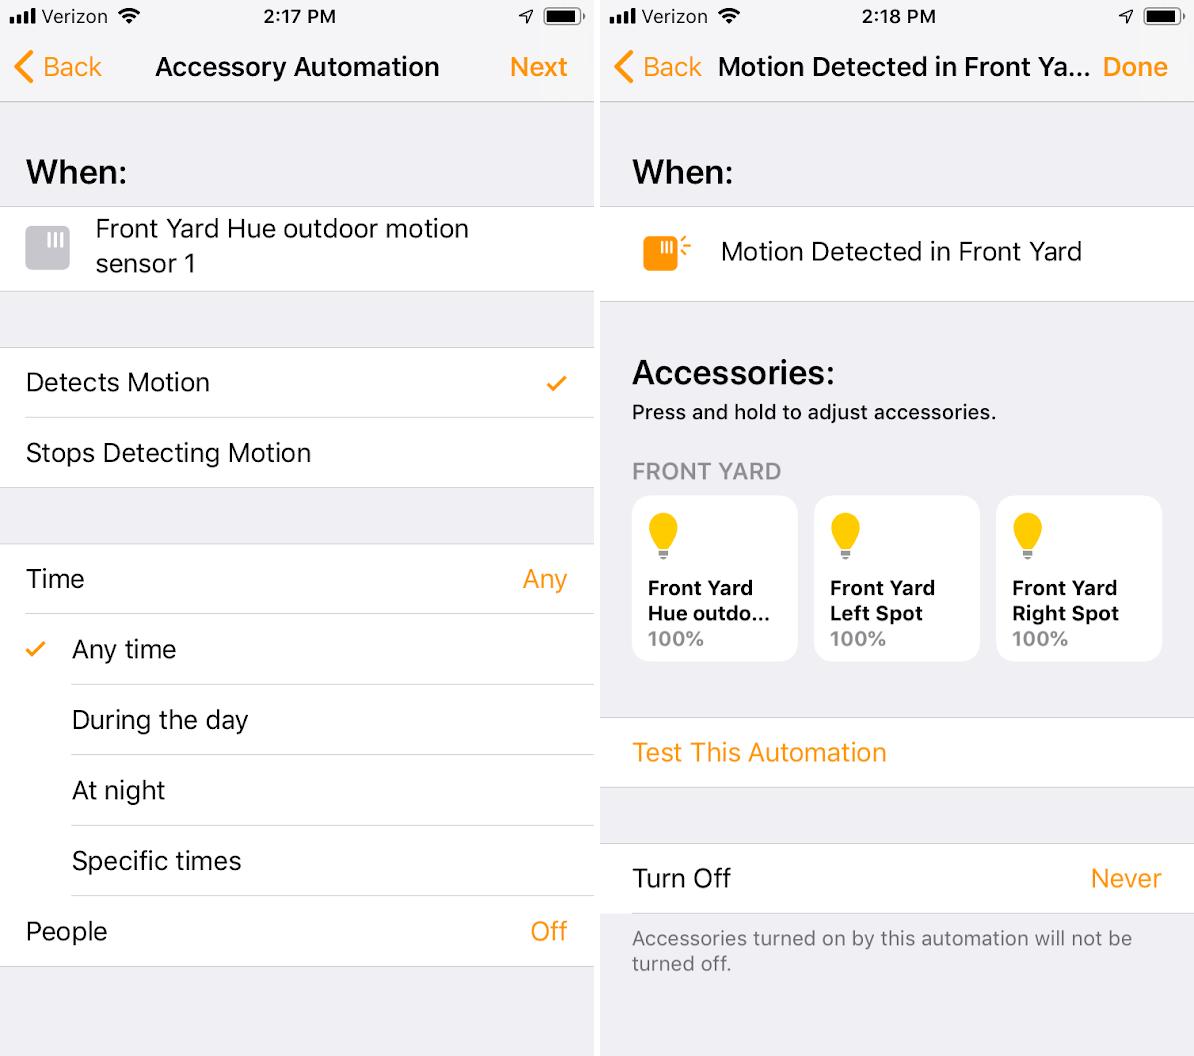 philips-hue-outdoor-sensor-home-app-homekit-automation